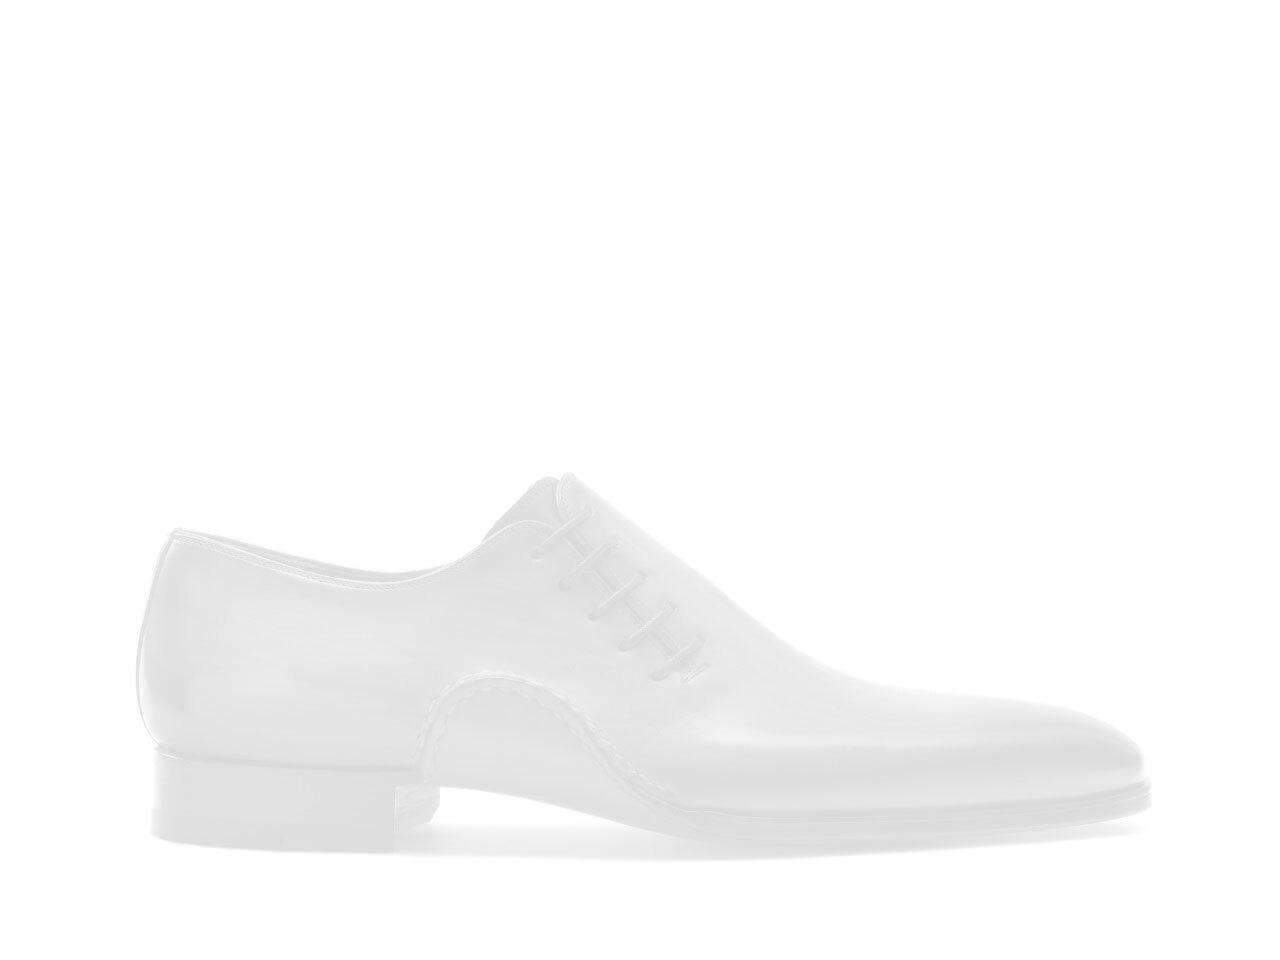 Pair of the Magnanni Bolsena Grey Men's Derby Shoes